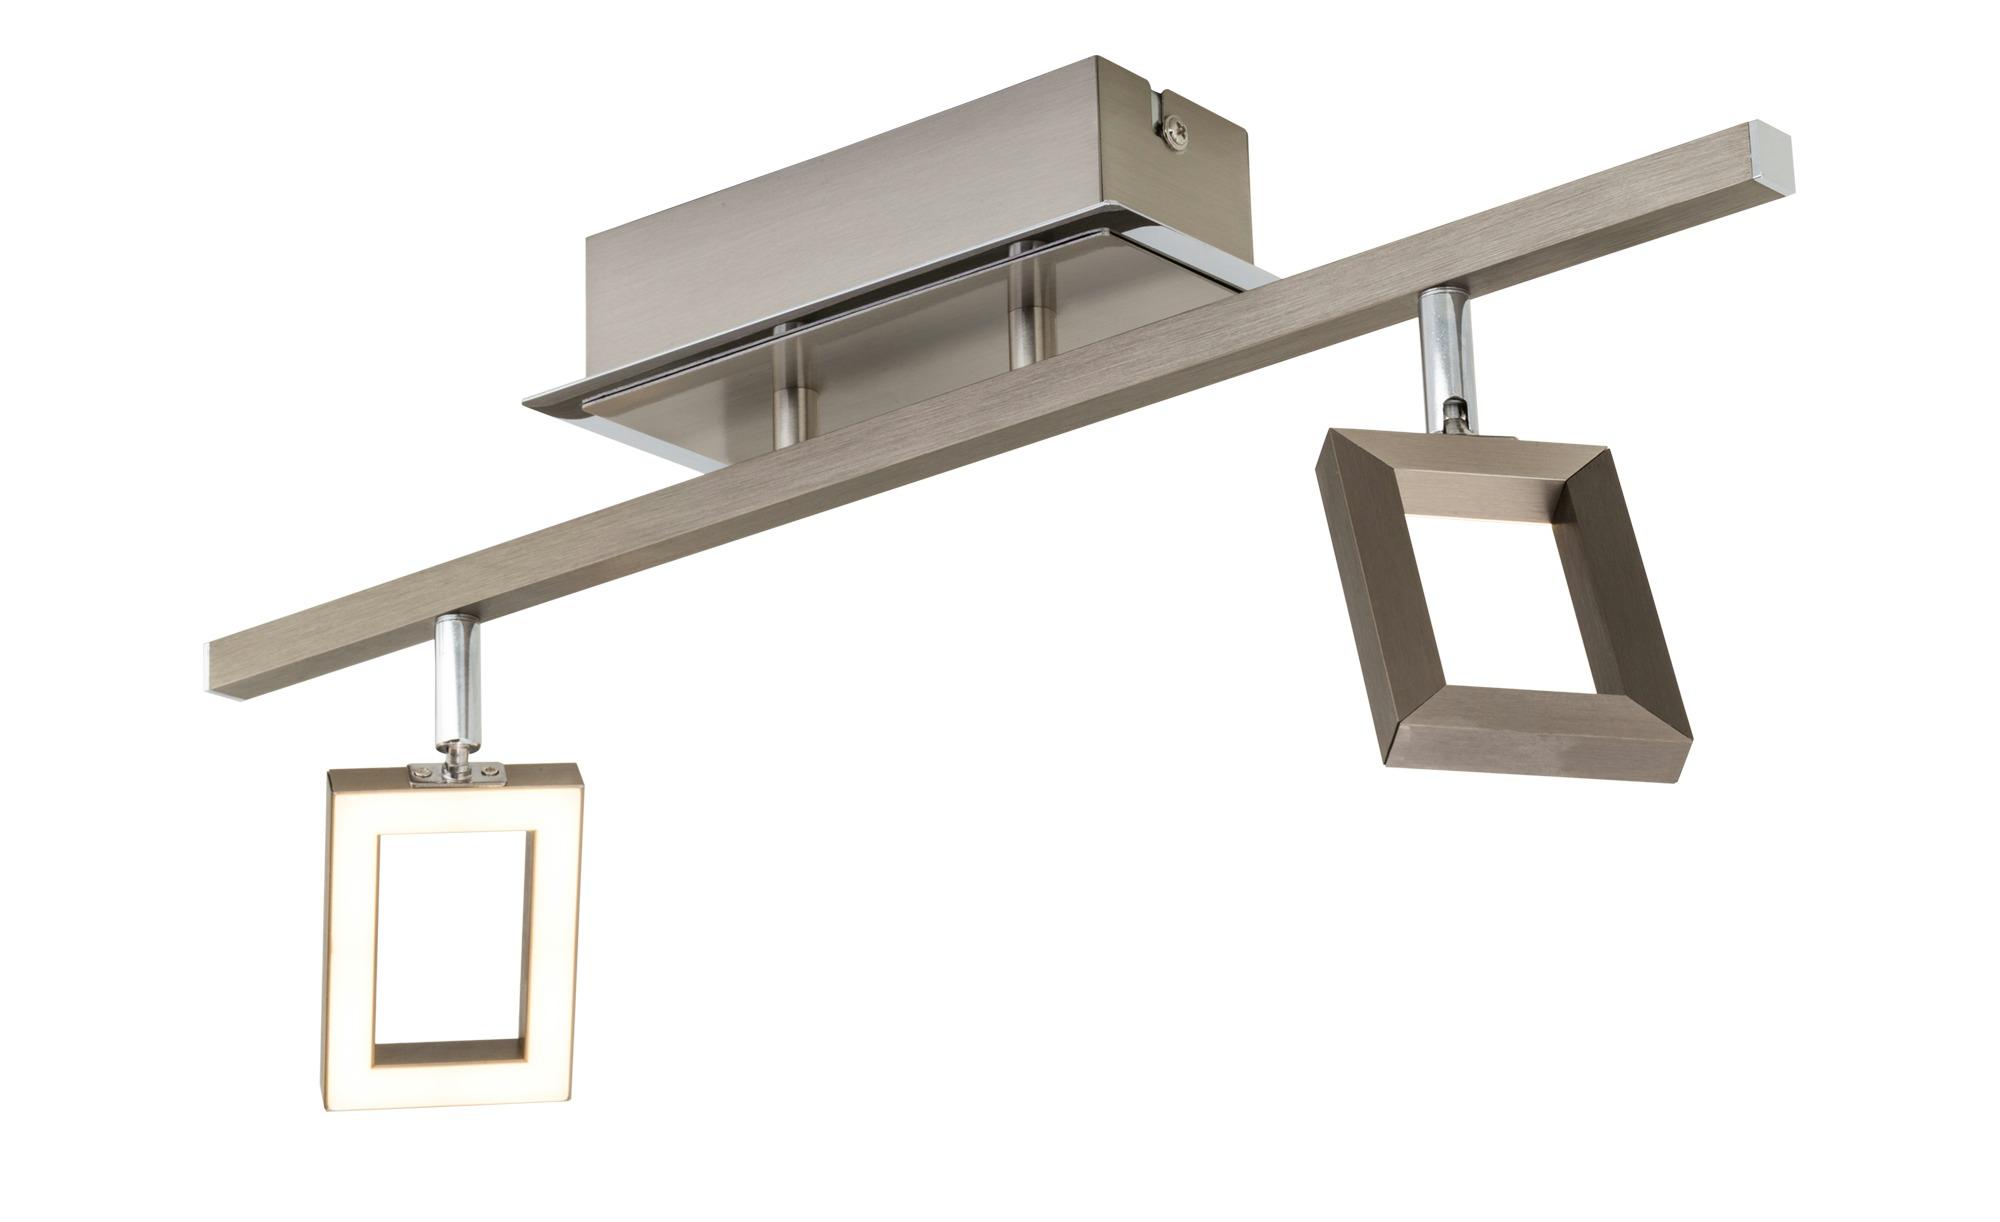 Paul Neuhaus LED-Deckenstrahler mit 2 quadratischen Spots ¦ silber ¦ Maße (cm): B: 53,5 Lampen & Leuchten > LED-Leuchten > LED-Strahler & Spots - Höffner